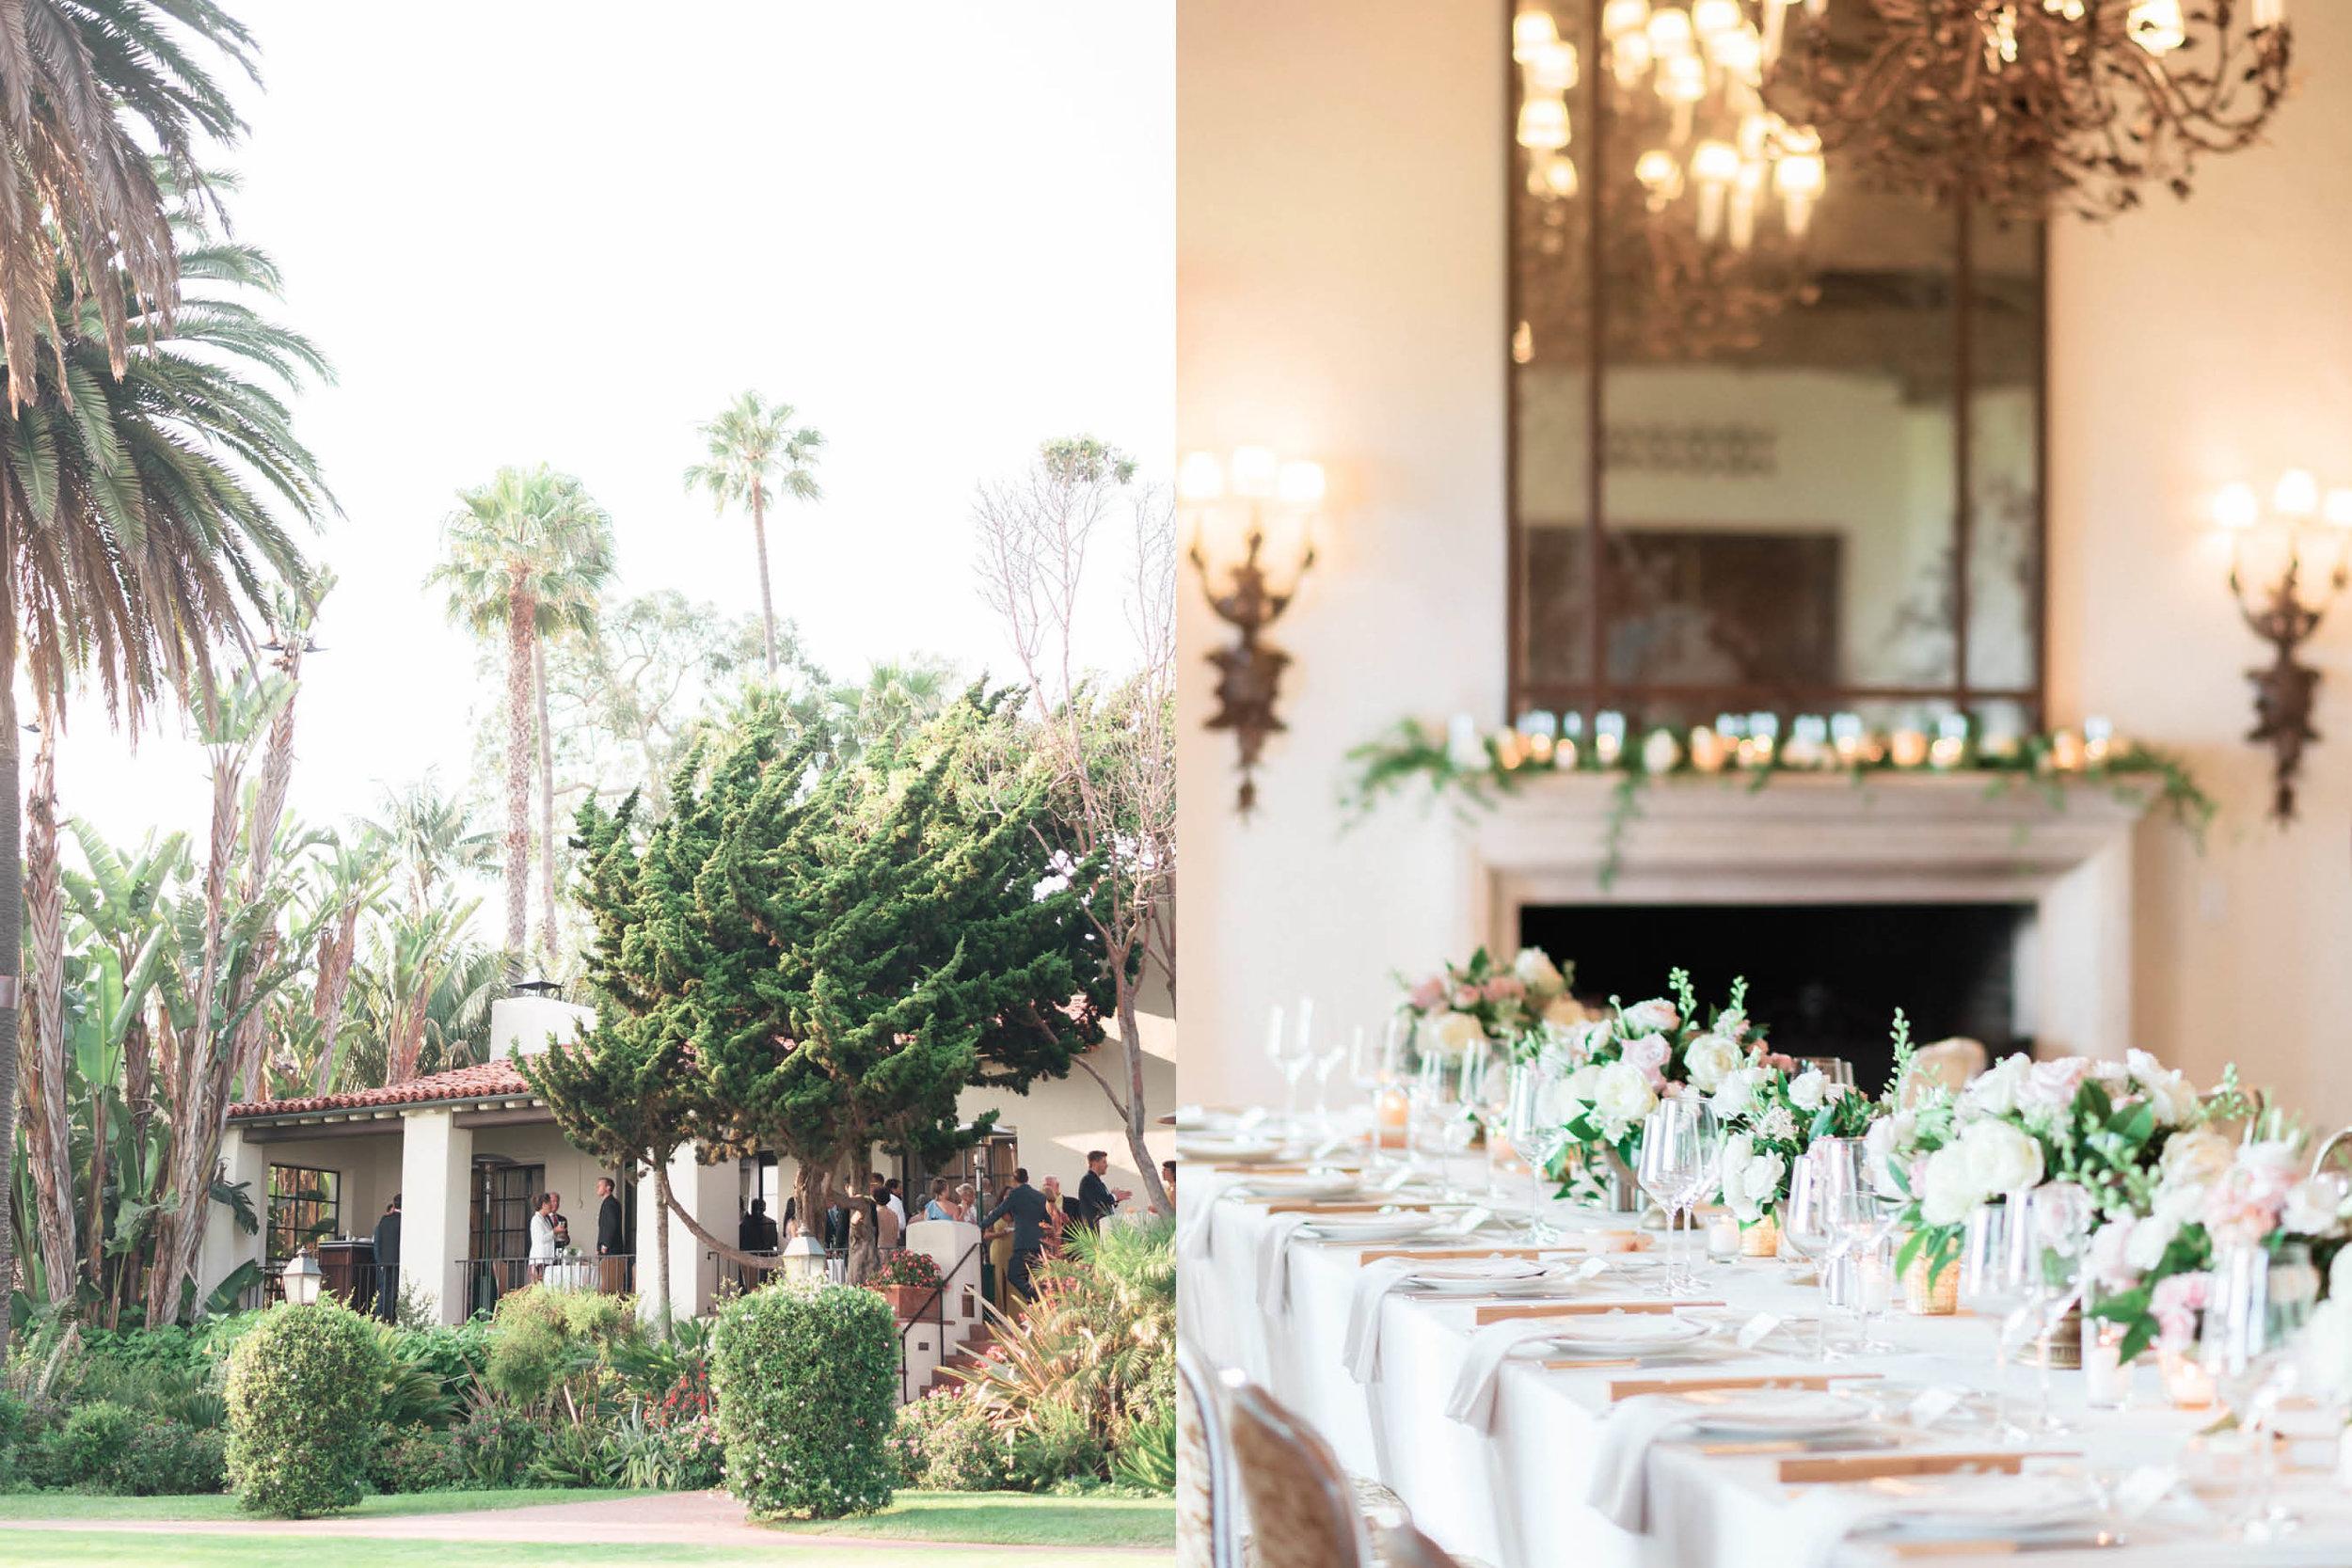 santa-barbara-elopement-elope-wedding-planner-coordinator-day-of-four-seasons-biltmore-ocean-front-view-garden-pink-white-green-montecito-black-tie (16).jpg